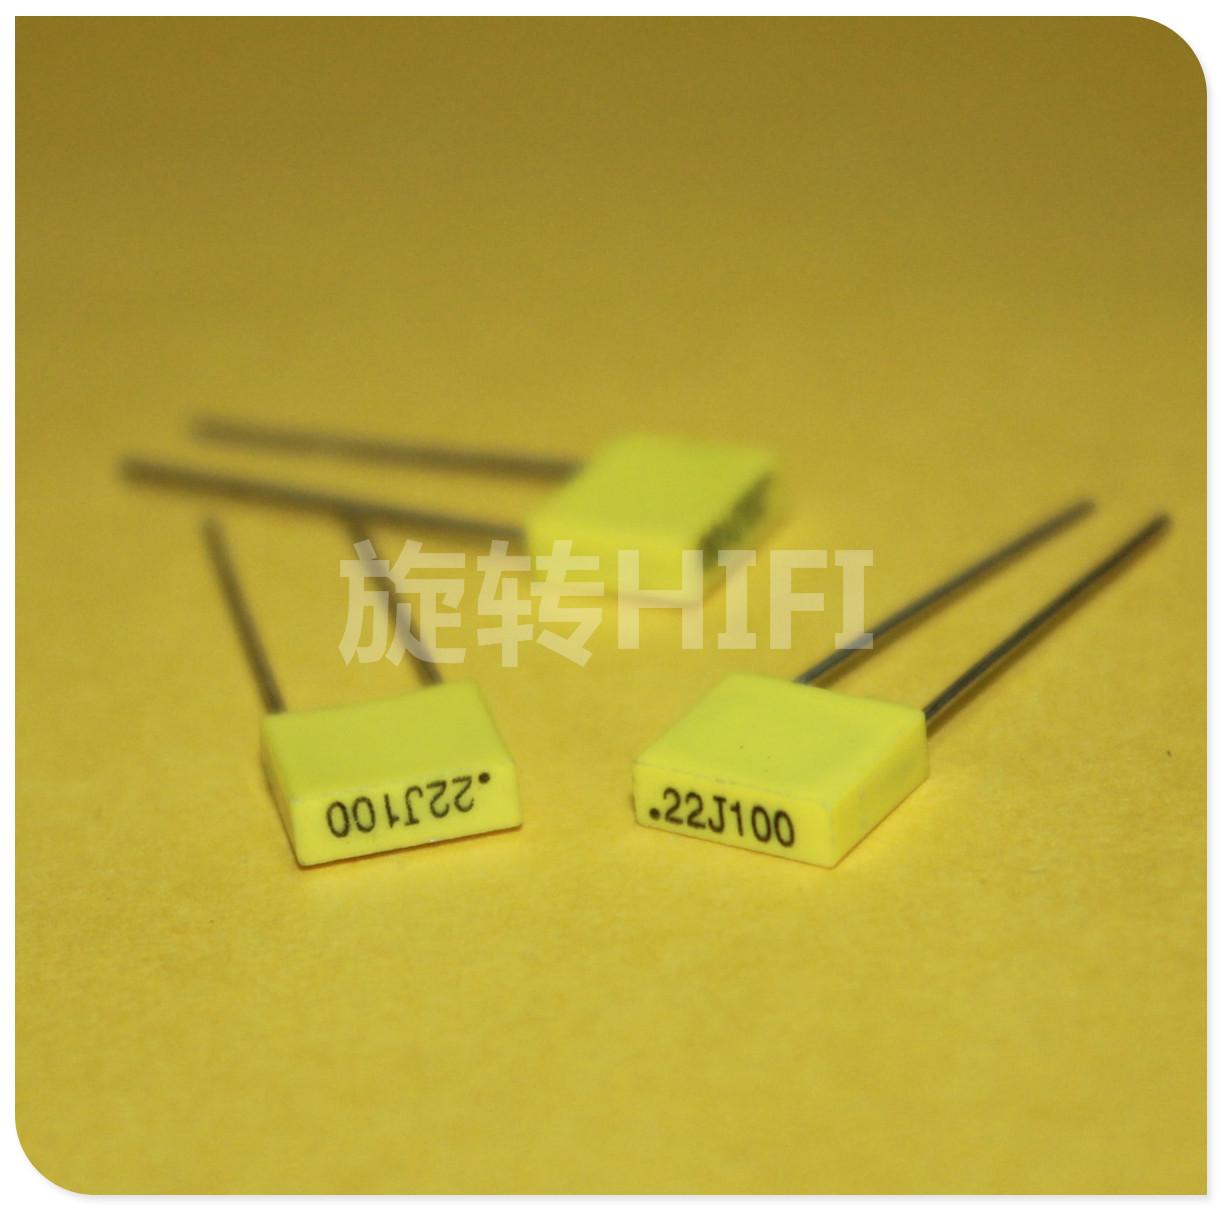 20pcs Italy AV 224/100v 220NF 0.22UF MKT R82 new deep yellow film coupling capacitors p5 free shipping(China (Mainland))